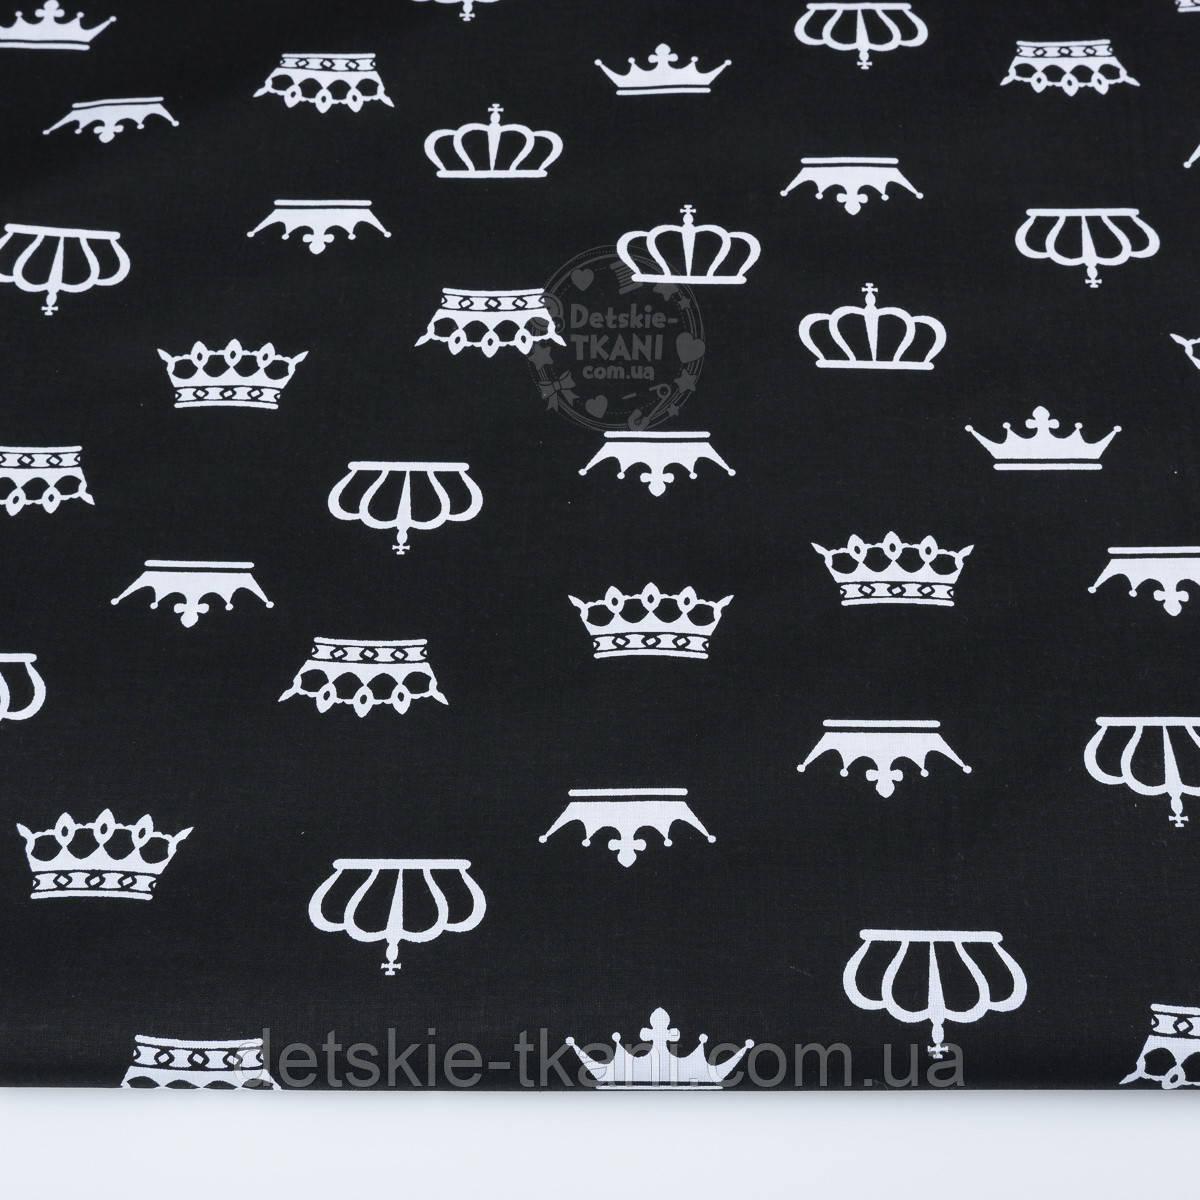 Ткань хлопковая с белыми коронами на чёрном фоне (№ 1285а)